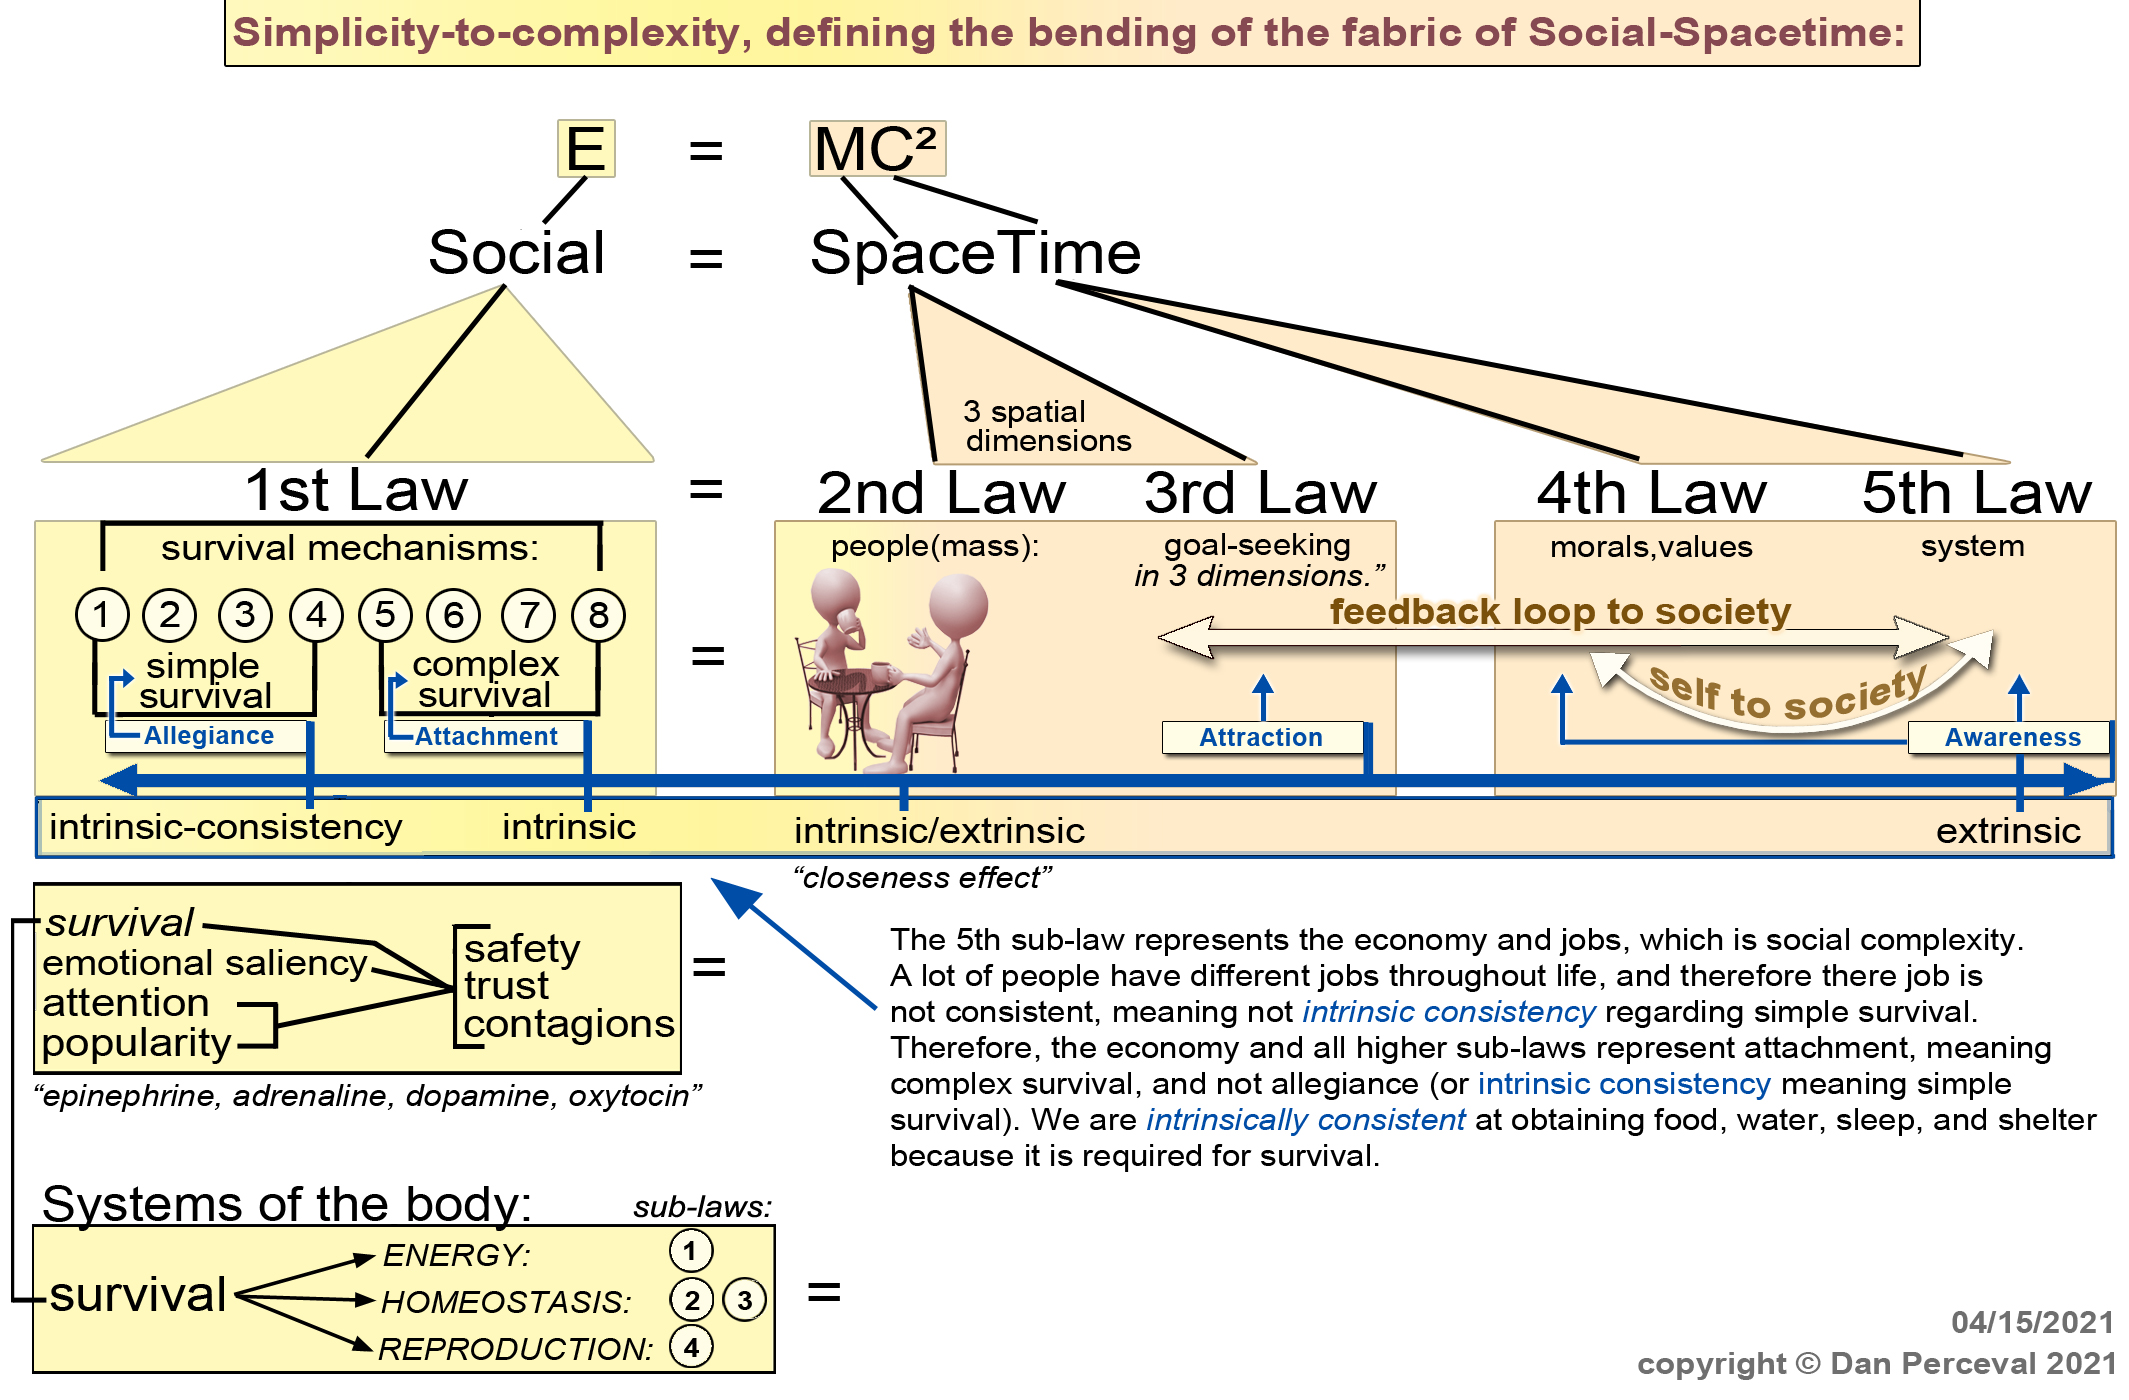 LawsOfSocialFabrics-simplicity-complexit